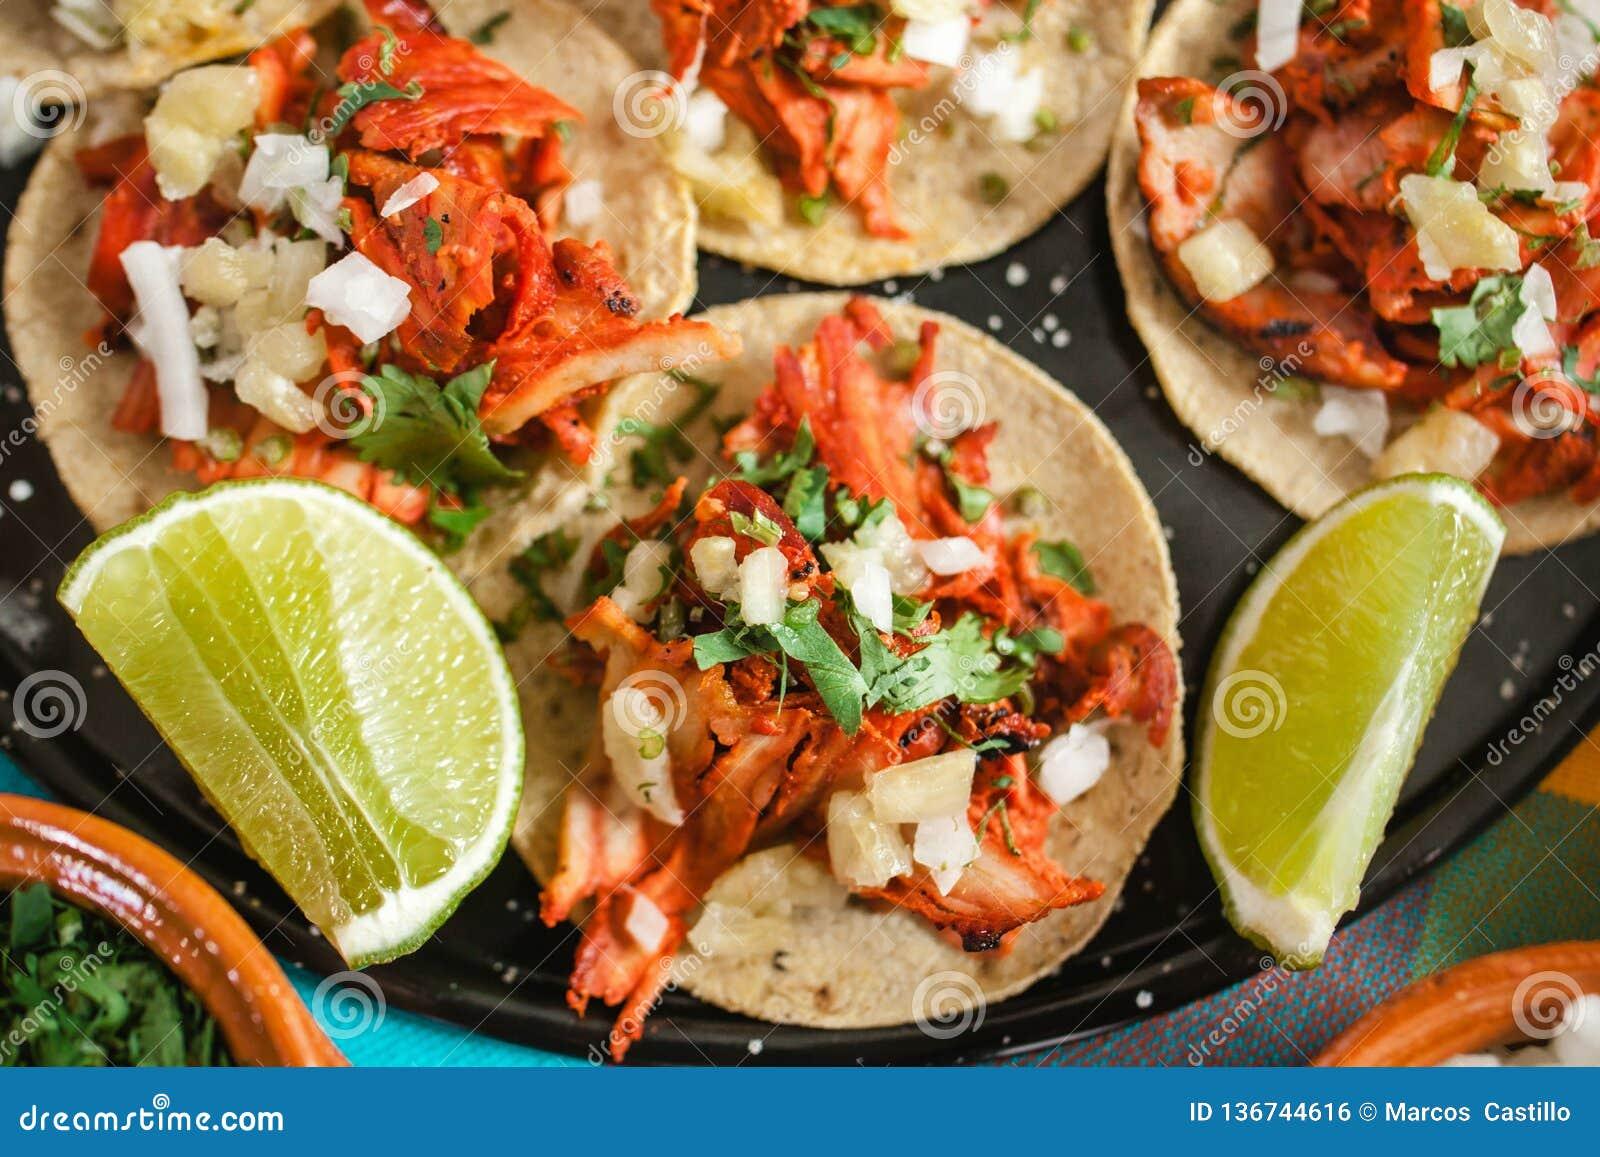 Tacoalpastor, mexikanischer Taco, Straßennahrung in Mexiko City